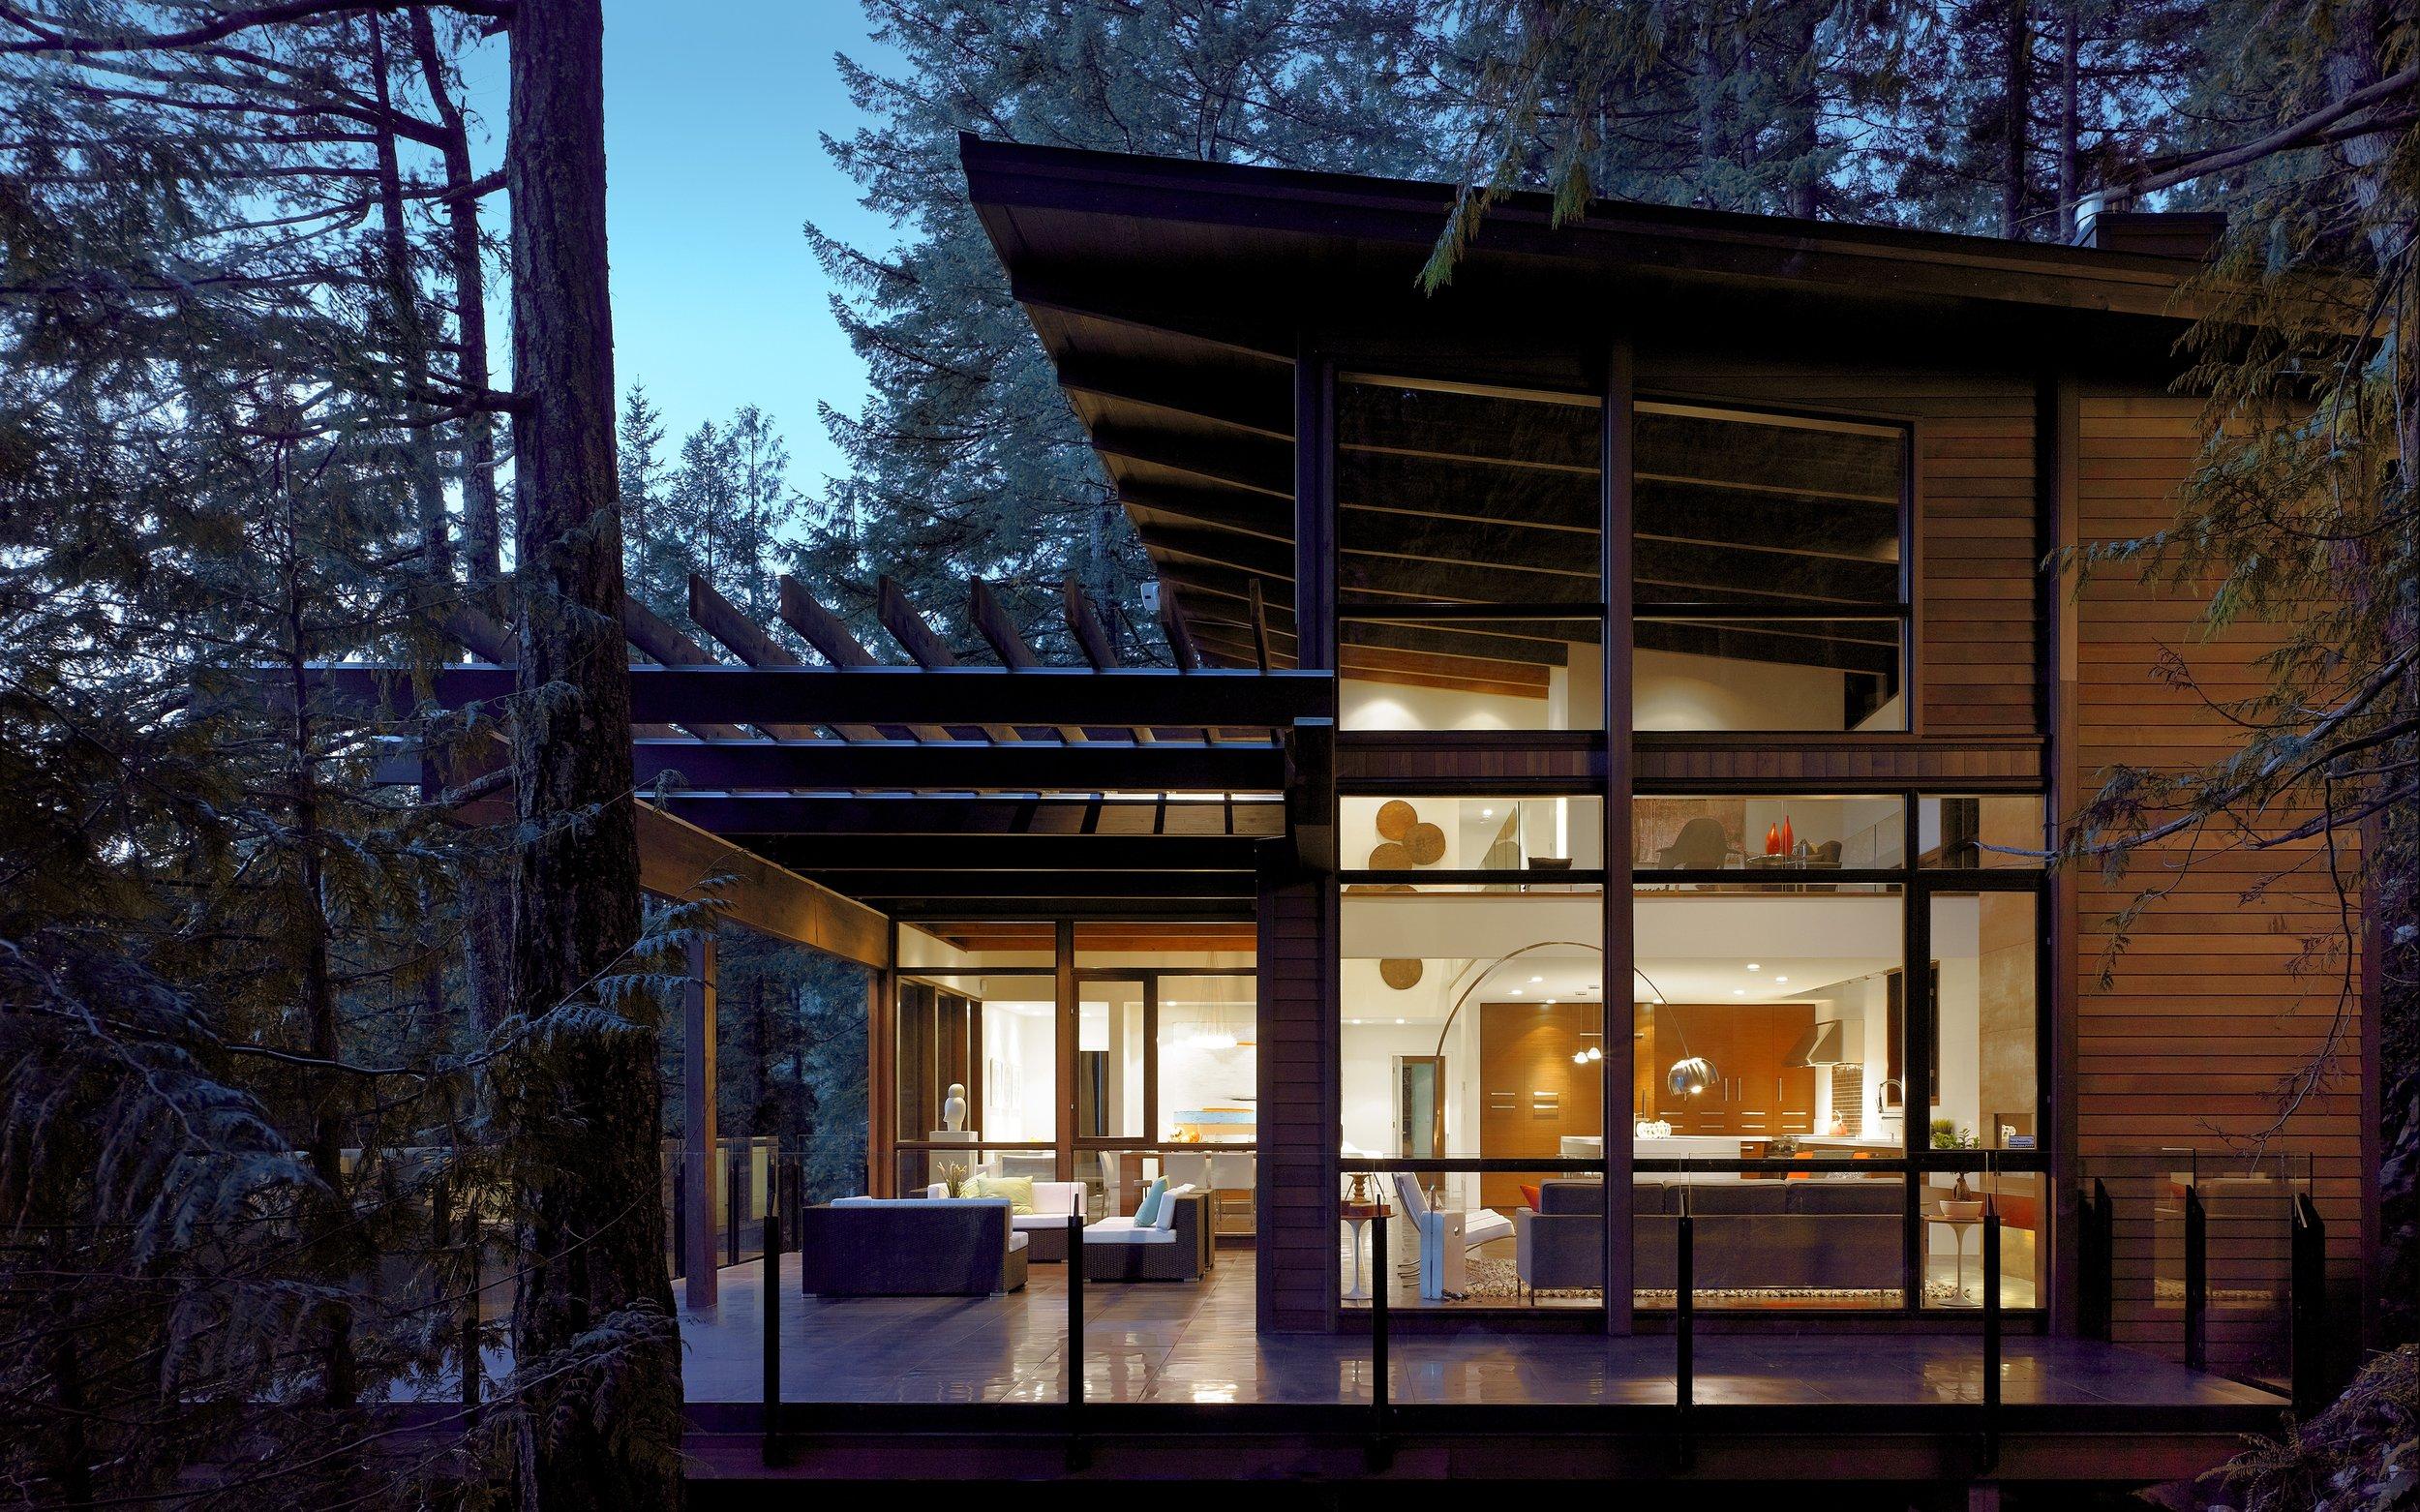 turkel_modern_design_prefab_gambier_island_house_exterior_evening.jpg